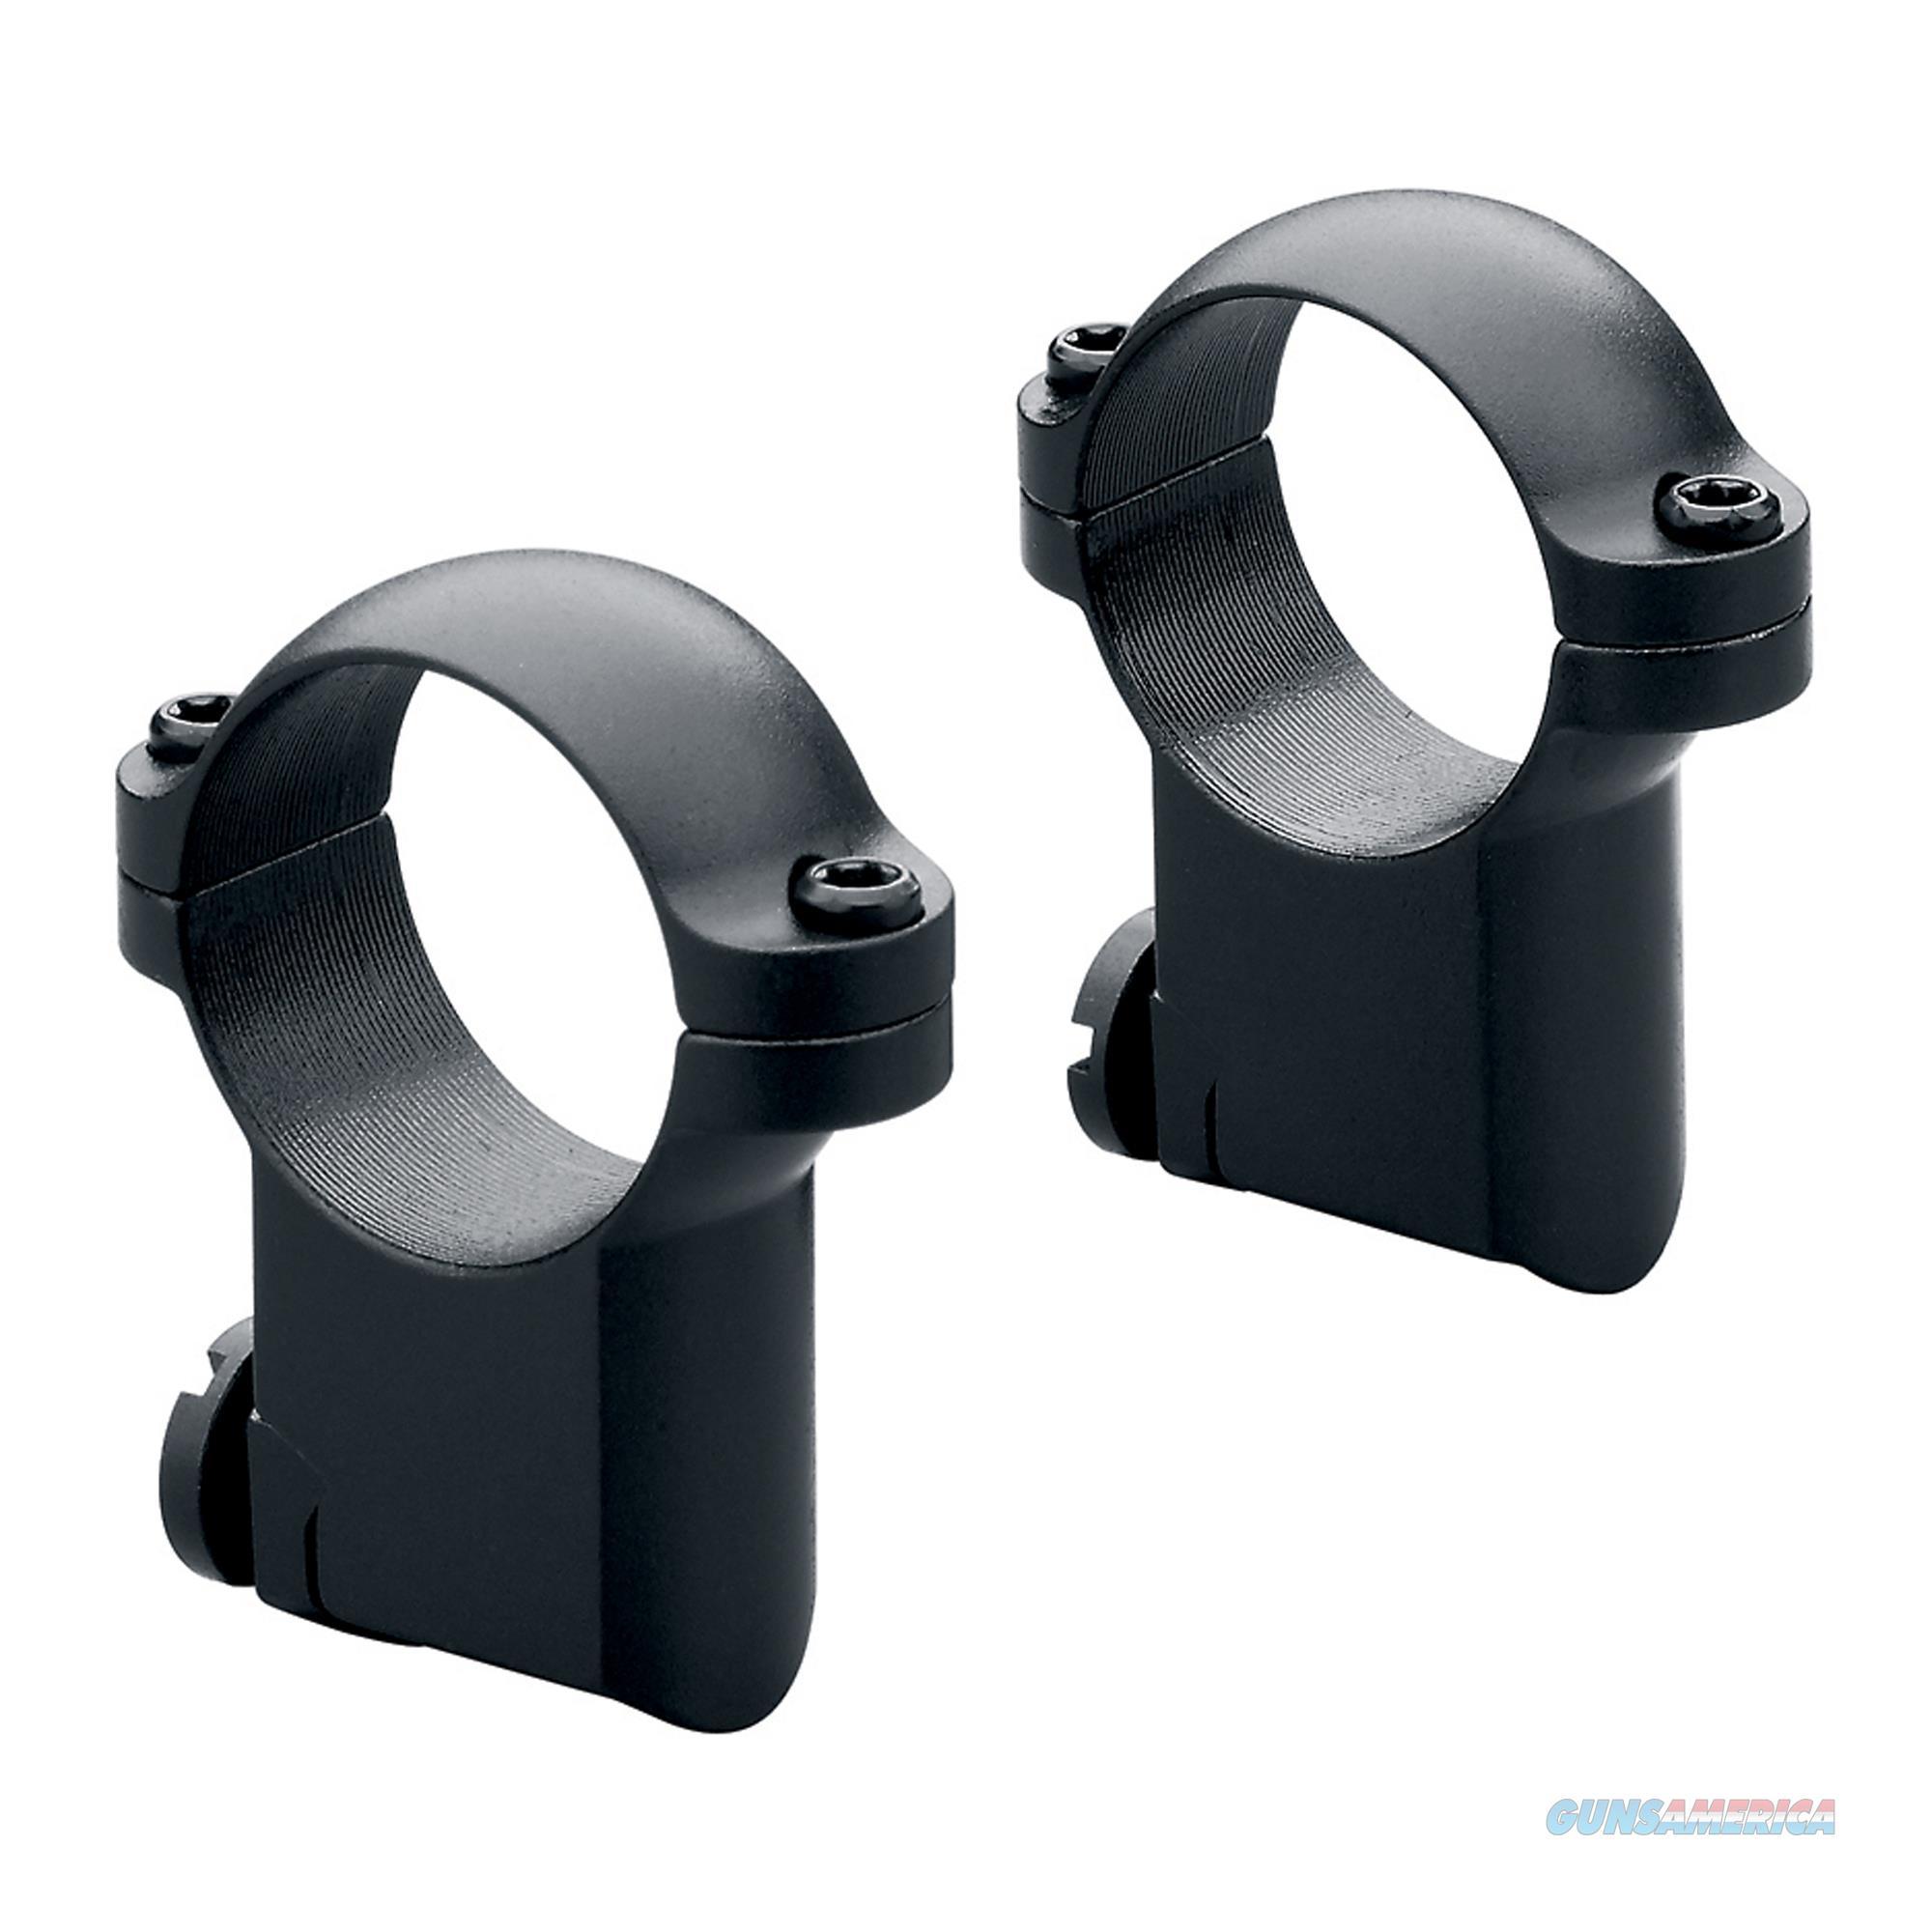 Leupold Ruger High Rings 50Mm Matte 49952  Non-Guns > Scopes/Mounts/Rings & Optics > Mounts > Other